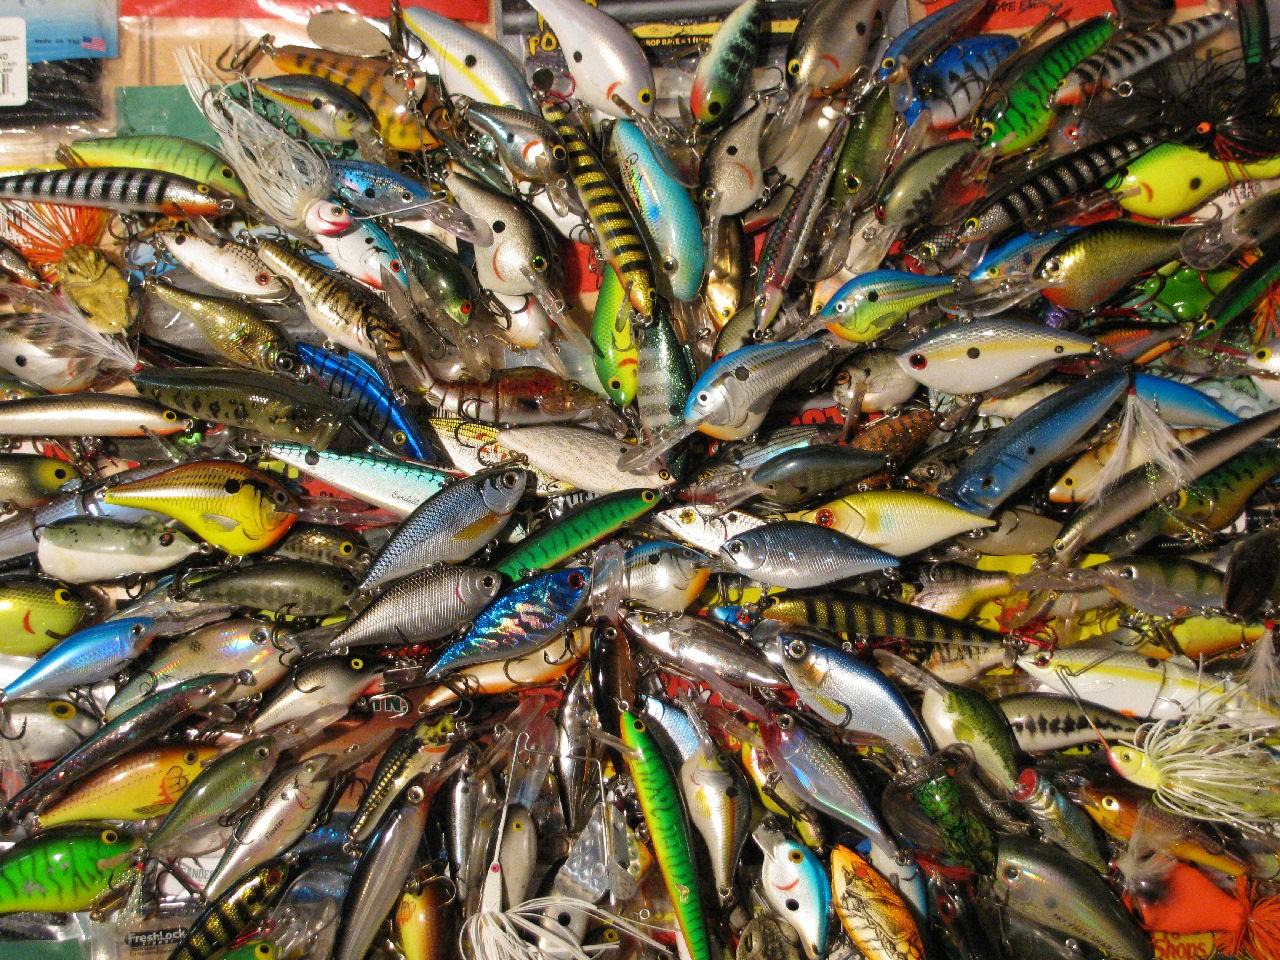 Fish Fishing Wallpaper 1280x960 Fish Fishing Vivid Colors Lure 1280x960